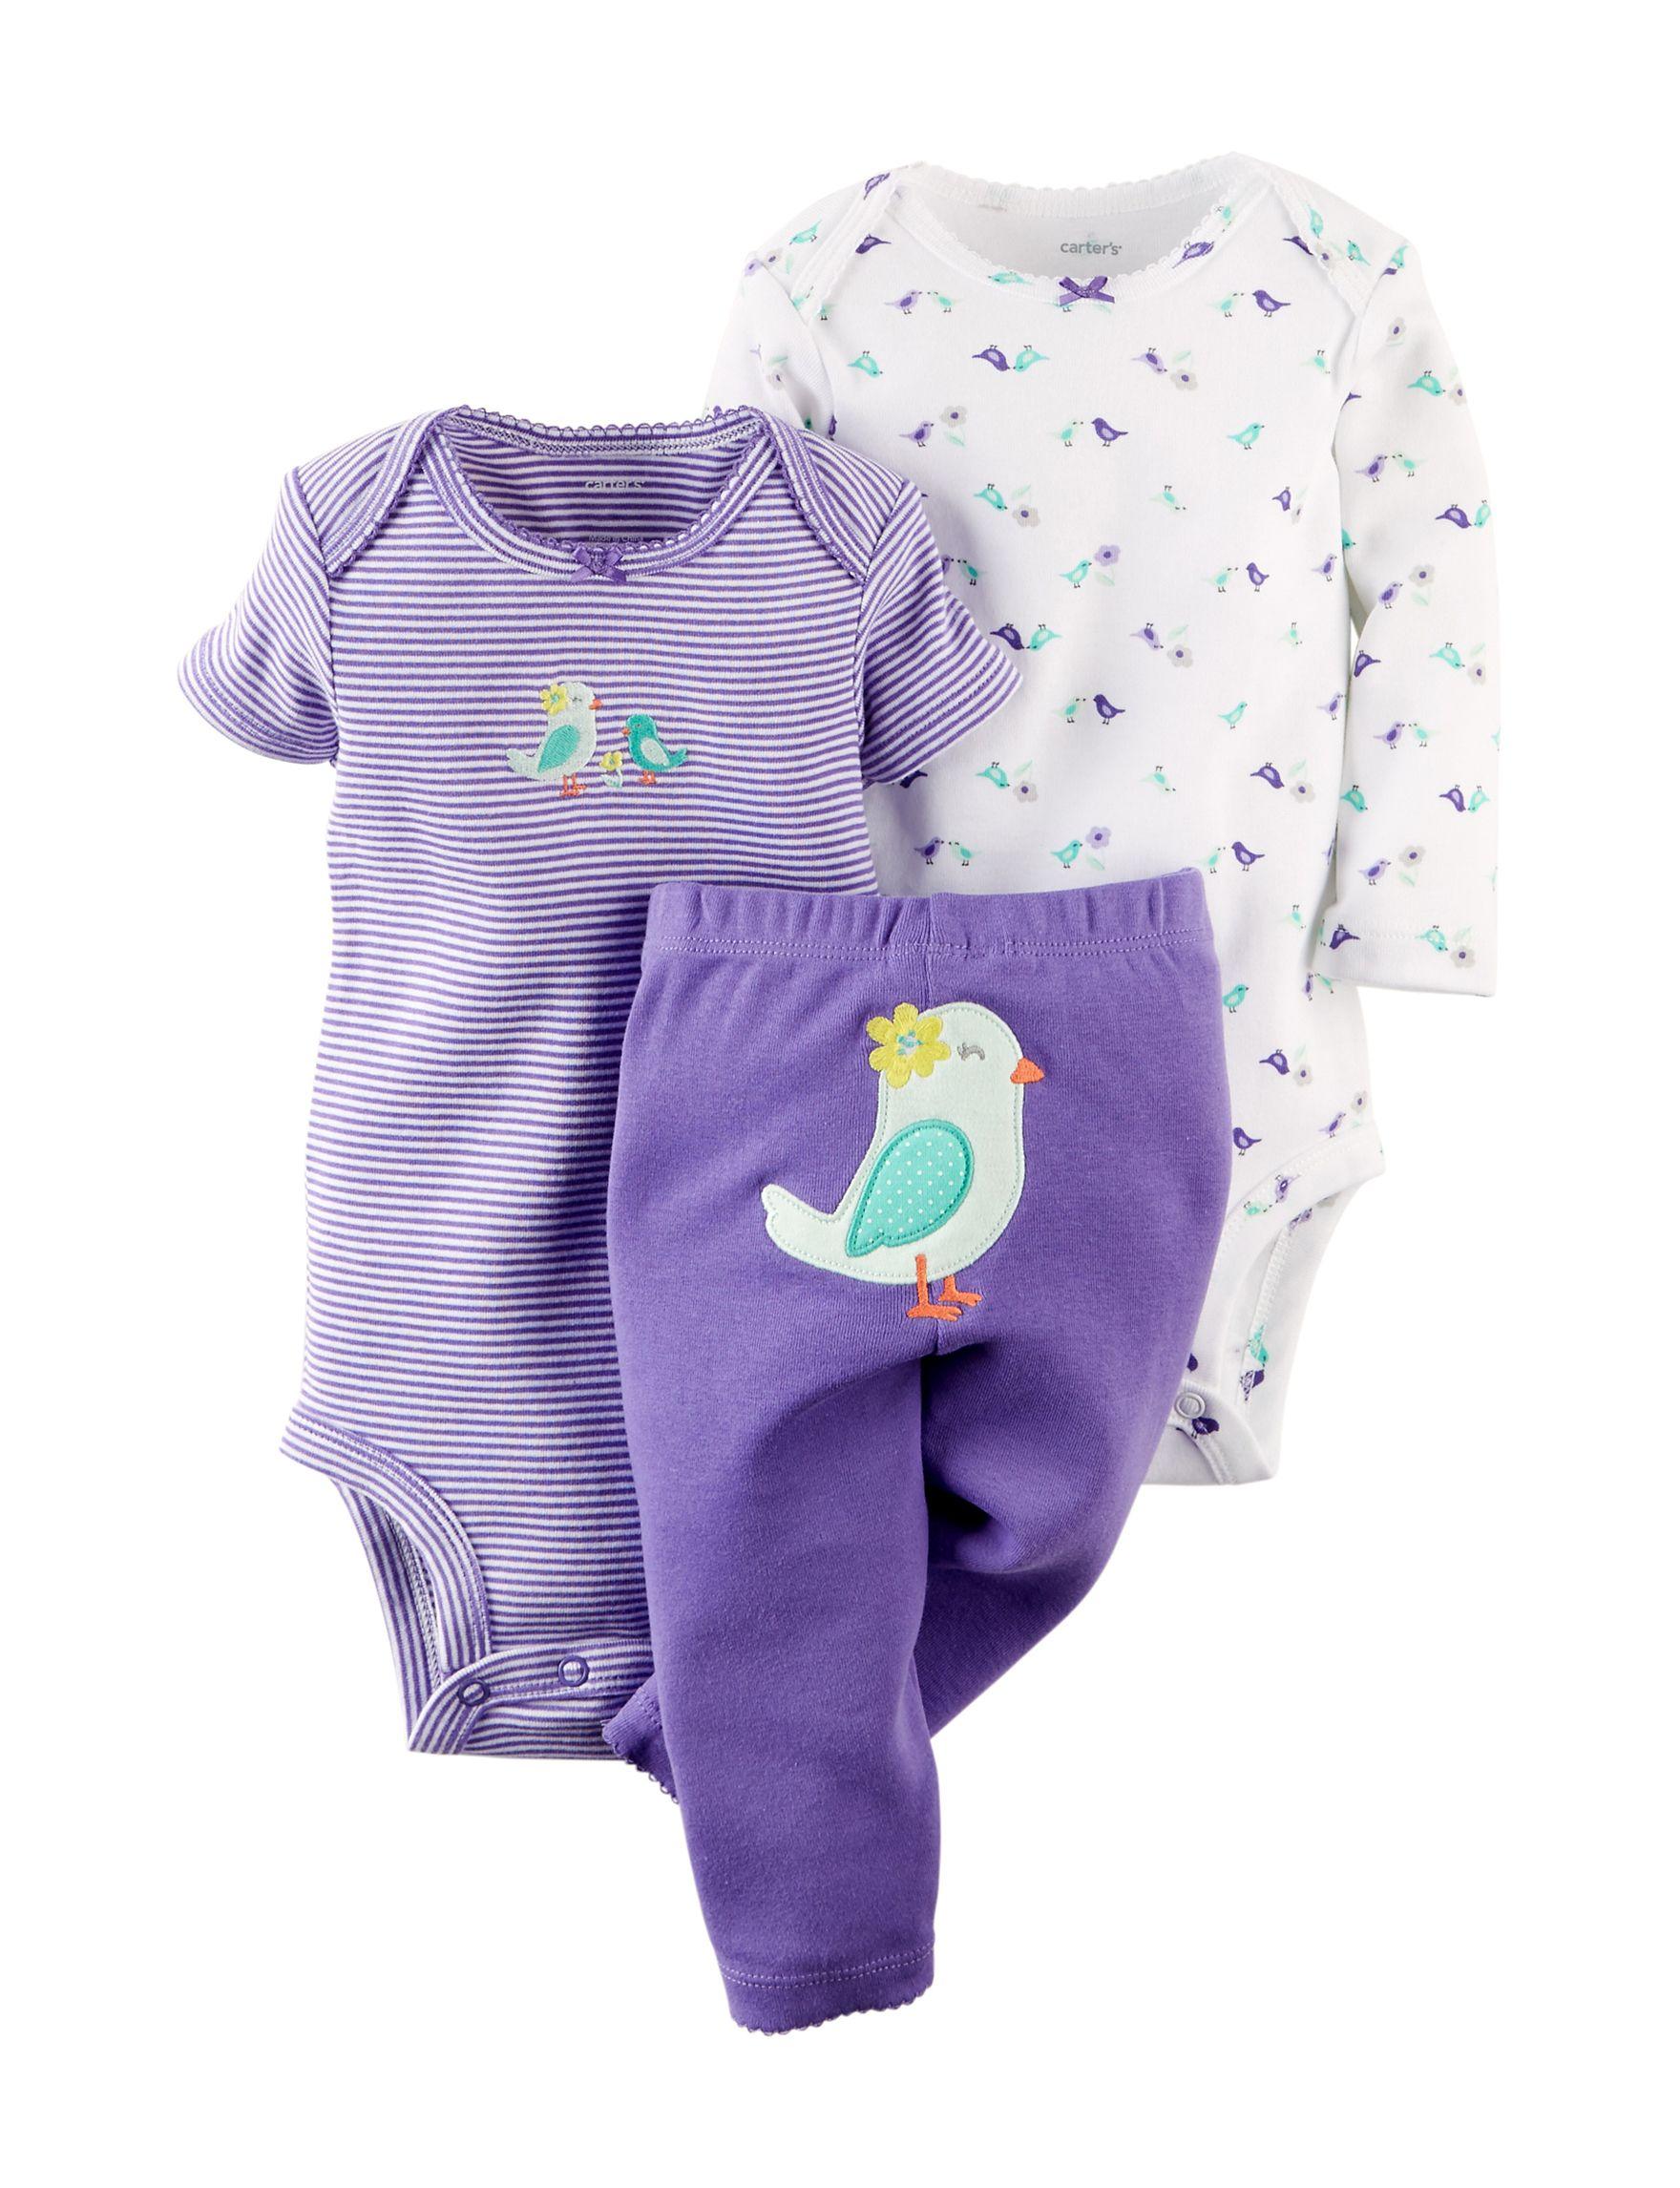 Shop today for Carter s 3 pc Purple & Teal Bird Print Bodysuit Set